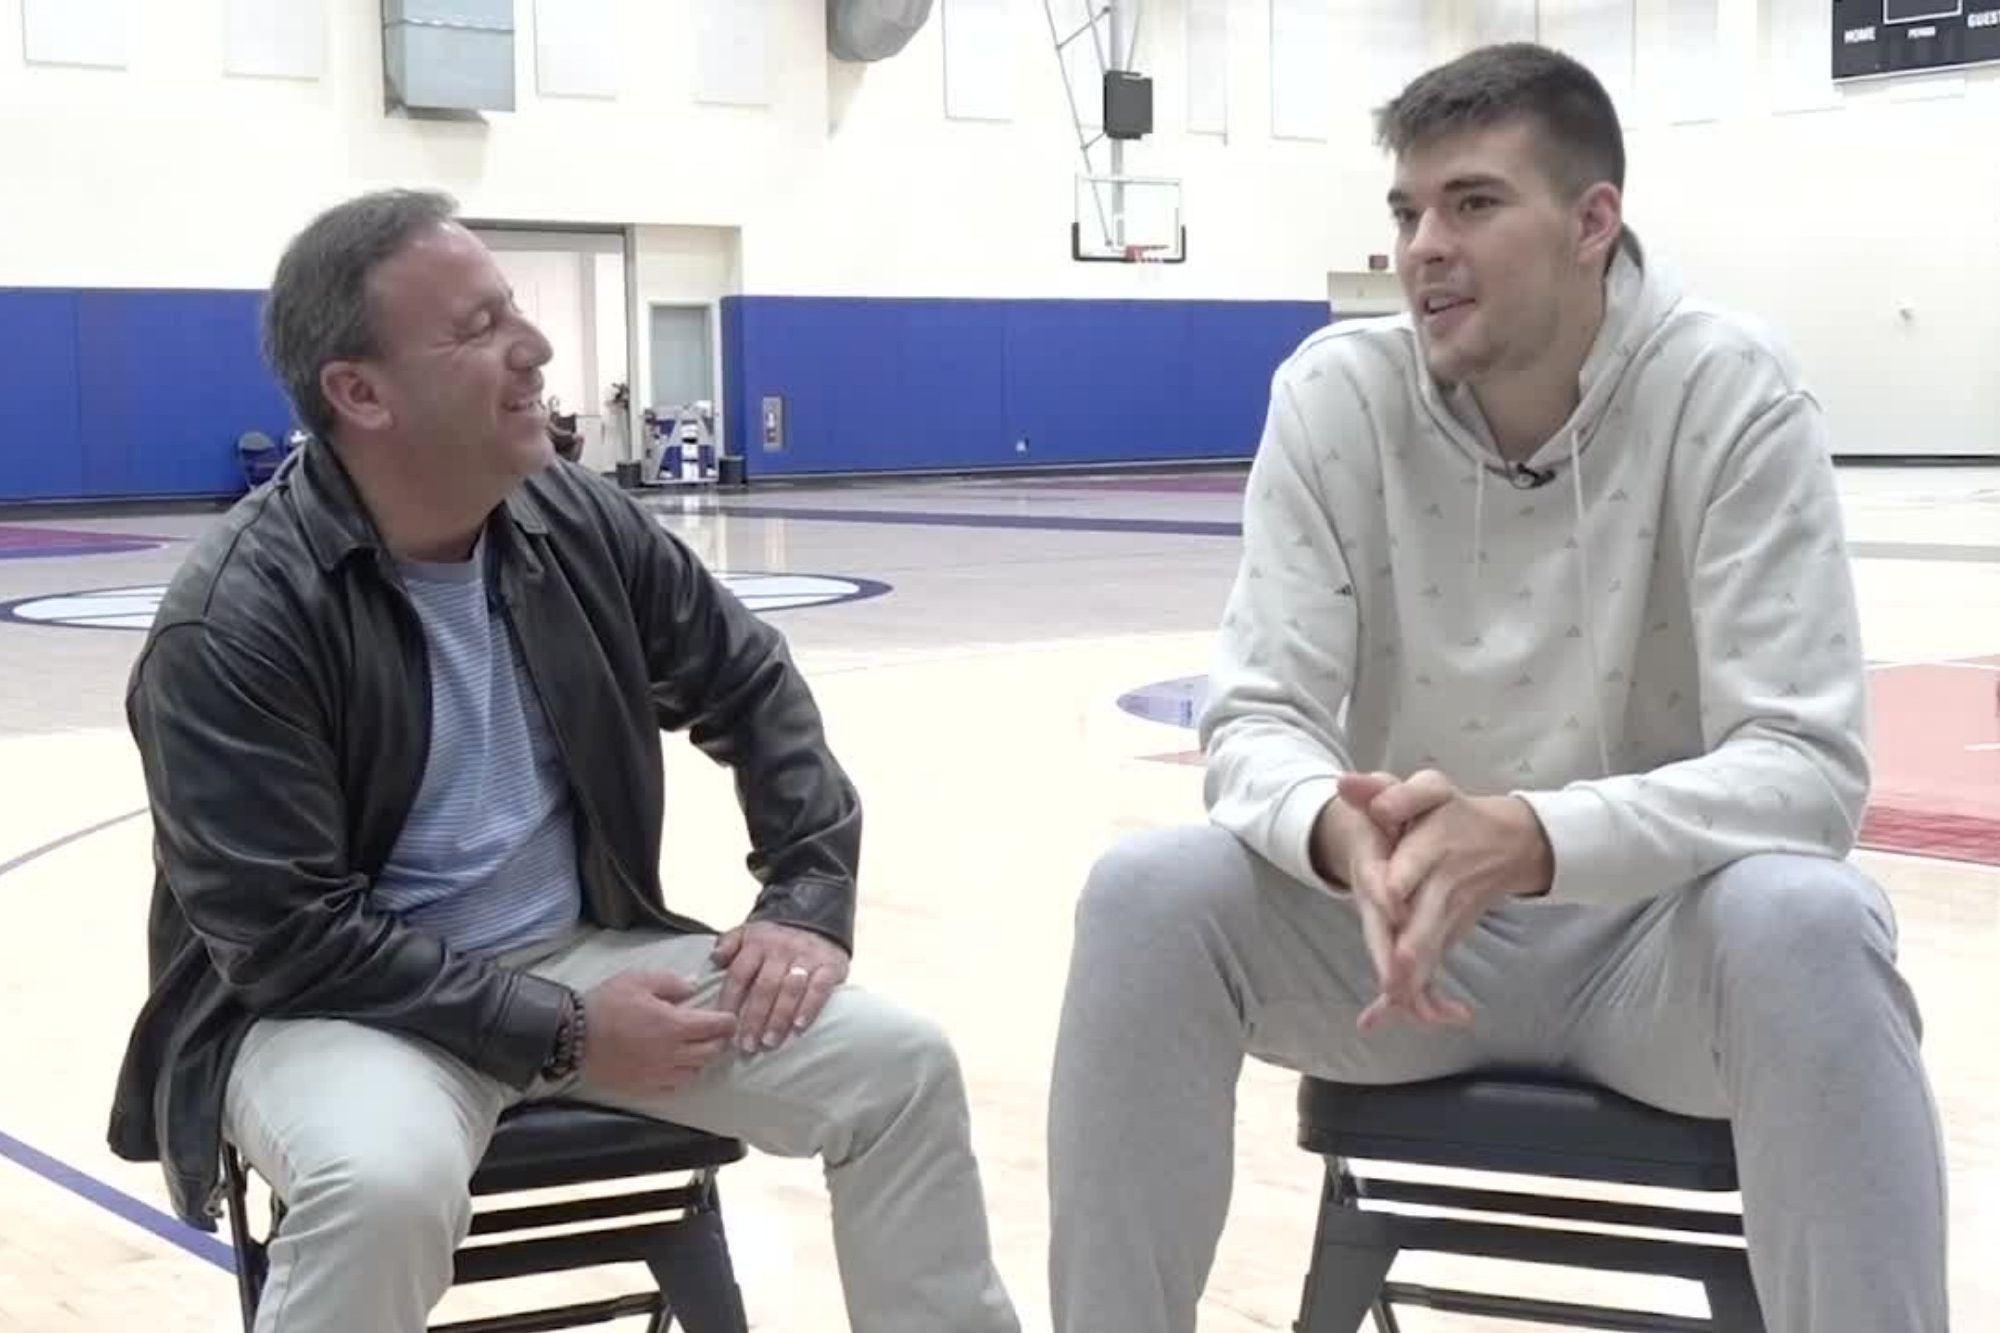 How This Croatian Basketball Player Made His NBA Dream Come True